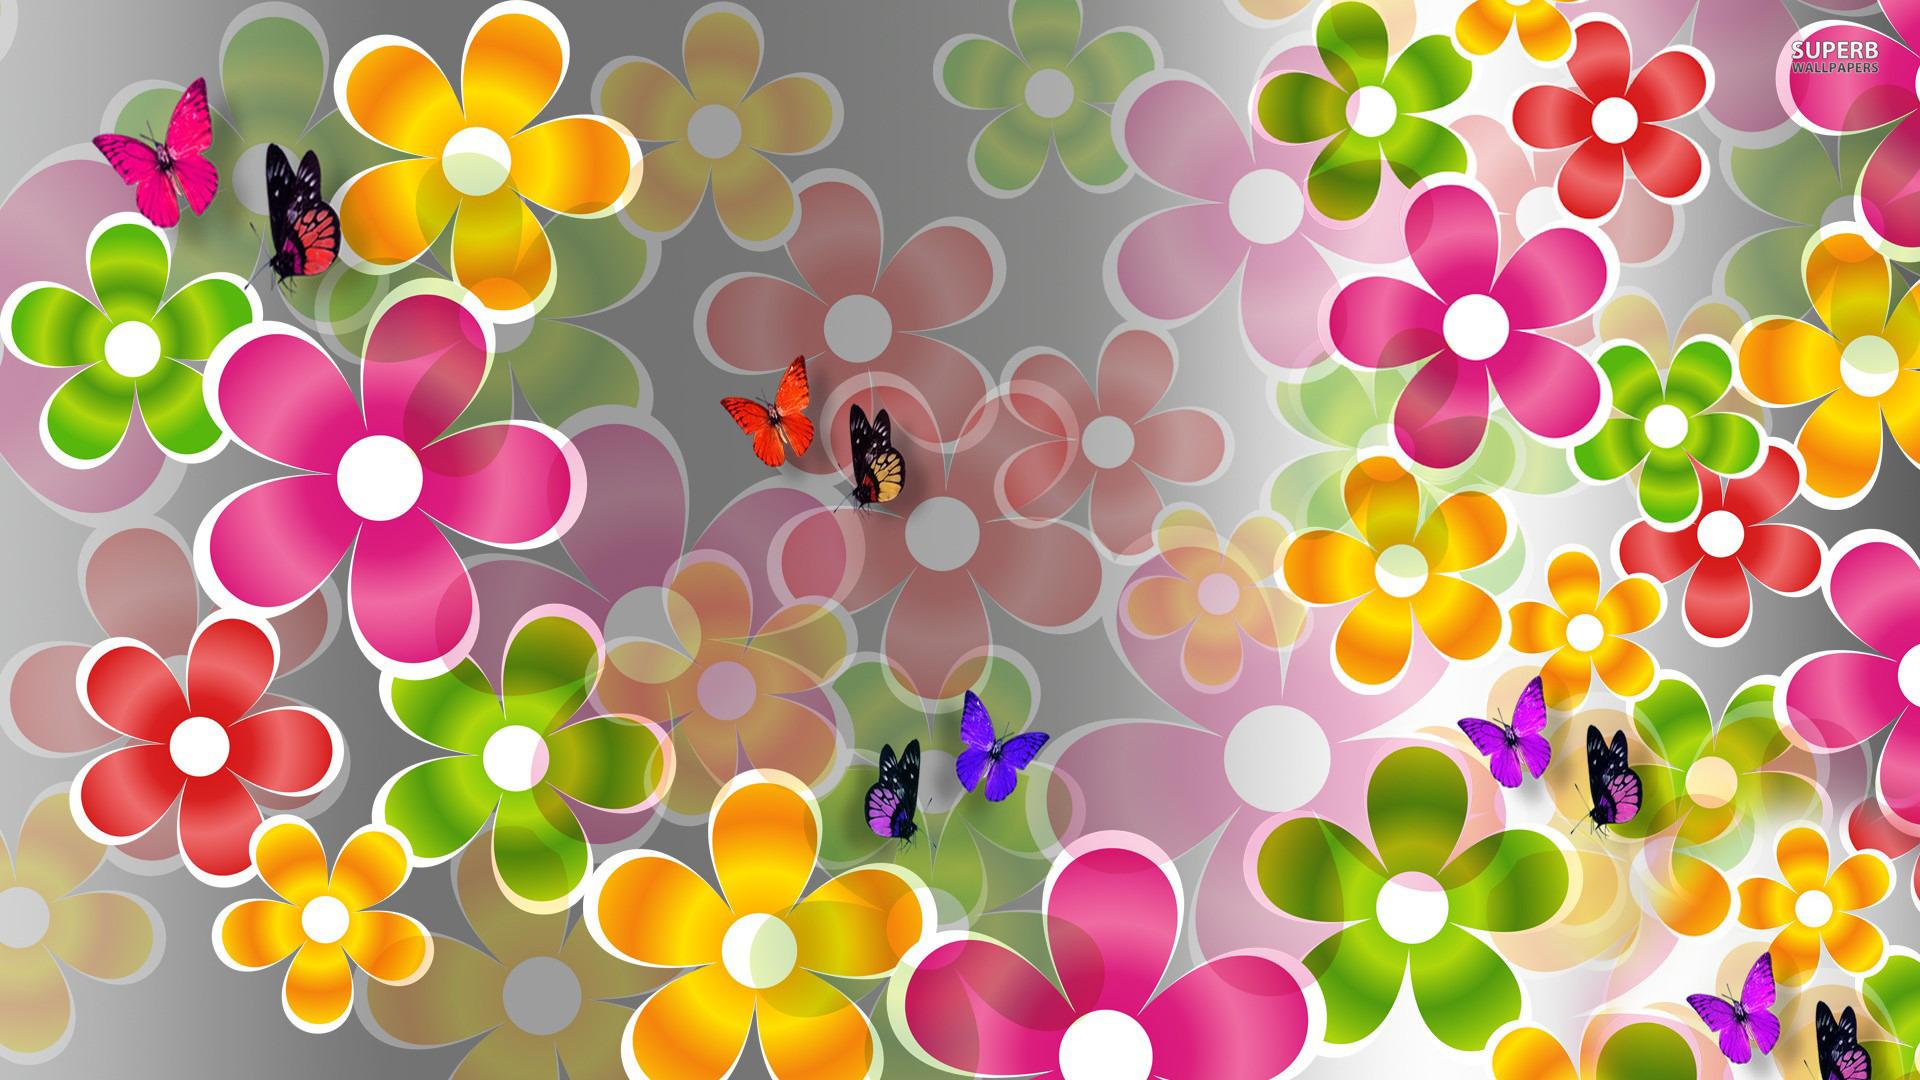 Background Wallpaper Design Butterfly 1920x1080 Wallpaper Teahub Io